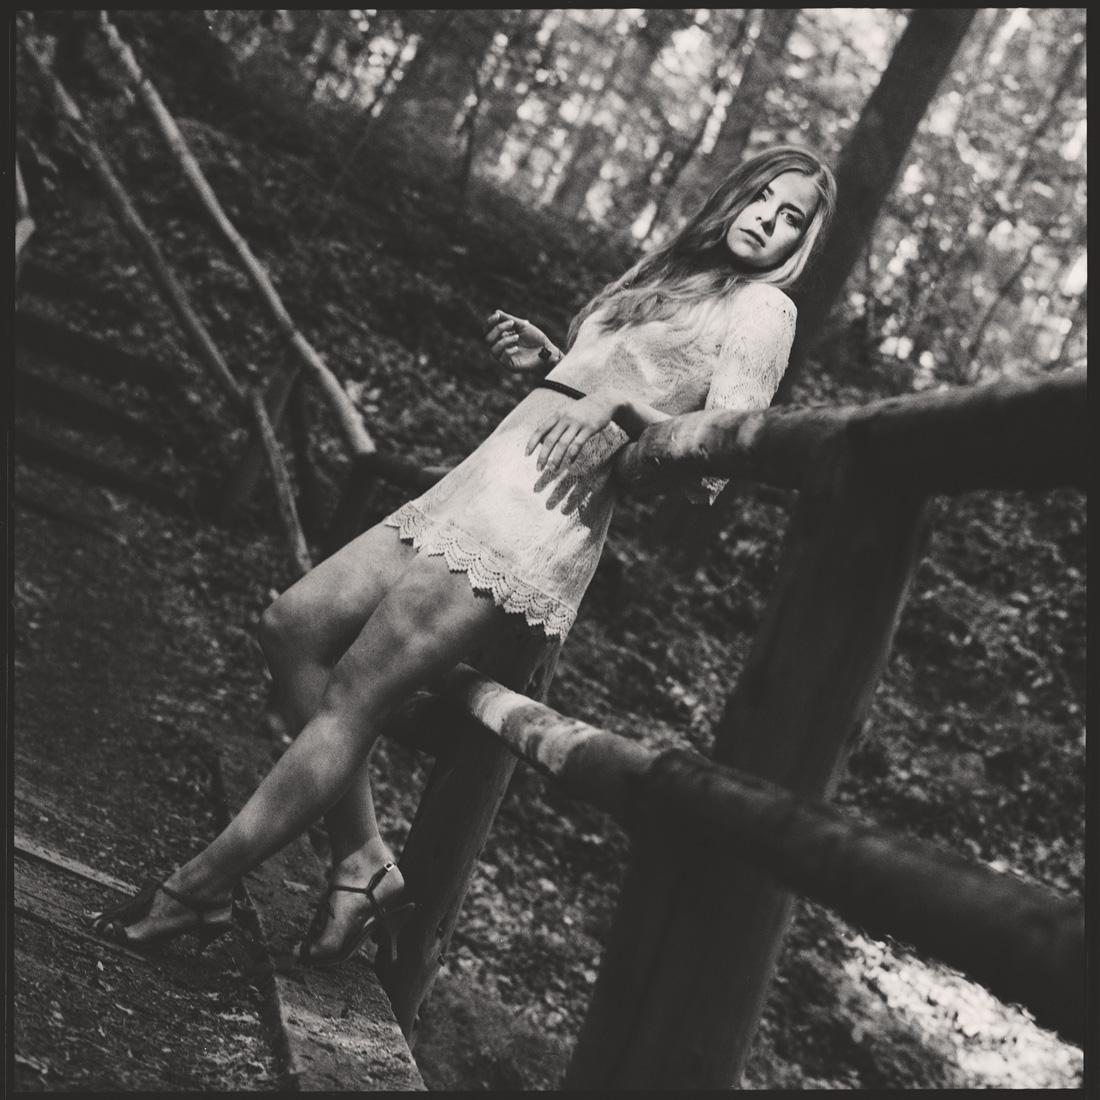 Fotoshoot mit Maria * Hasselblad * Mai 2015 * Gießen, Langgöns * Rossi Photography * Dein Portraitfotograf